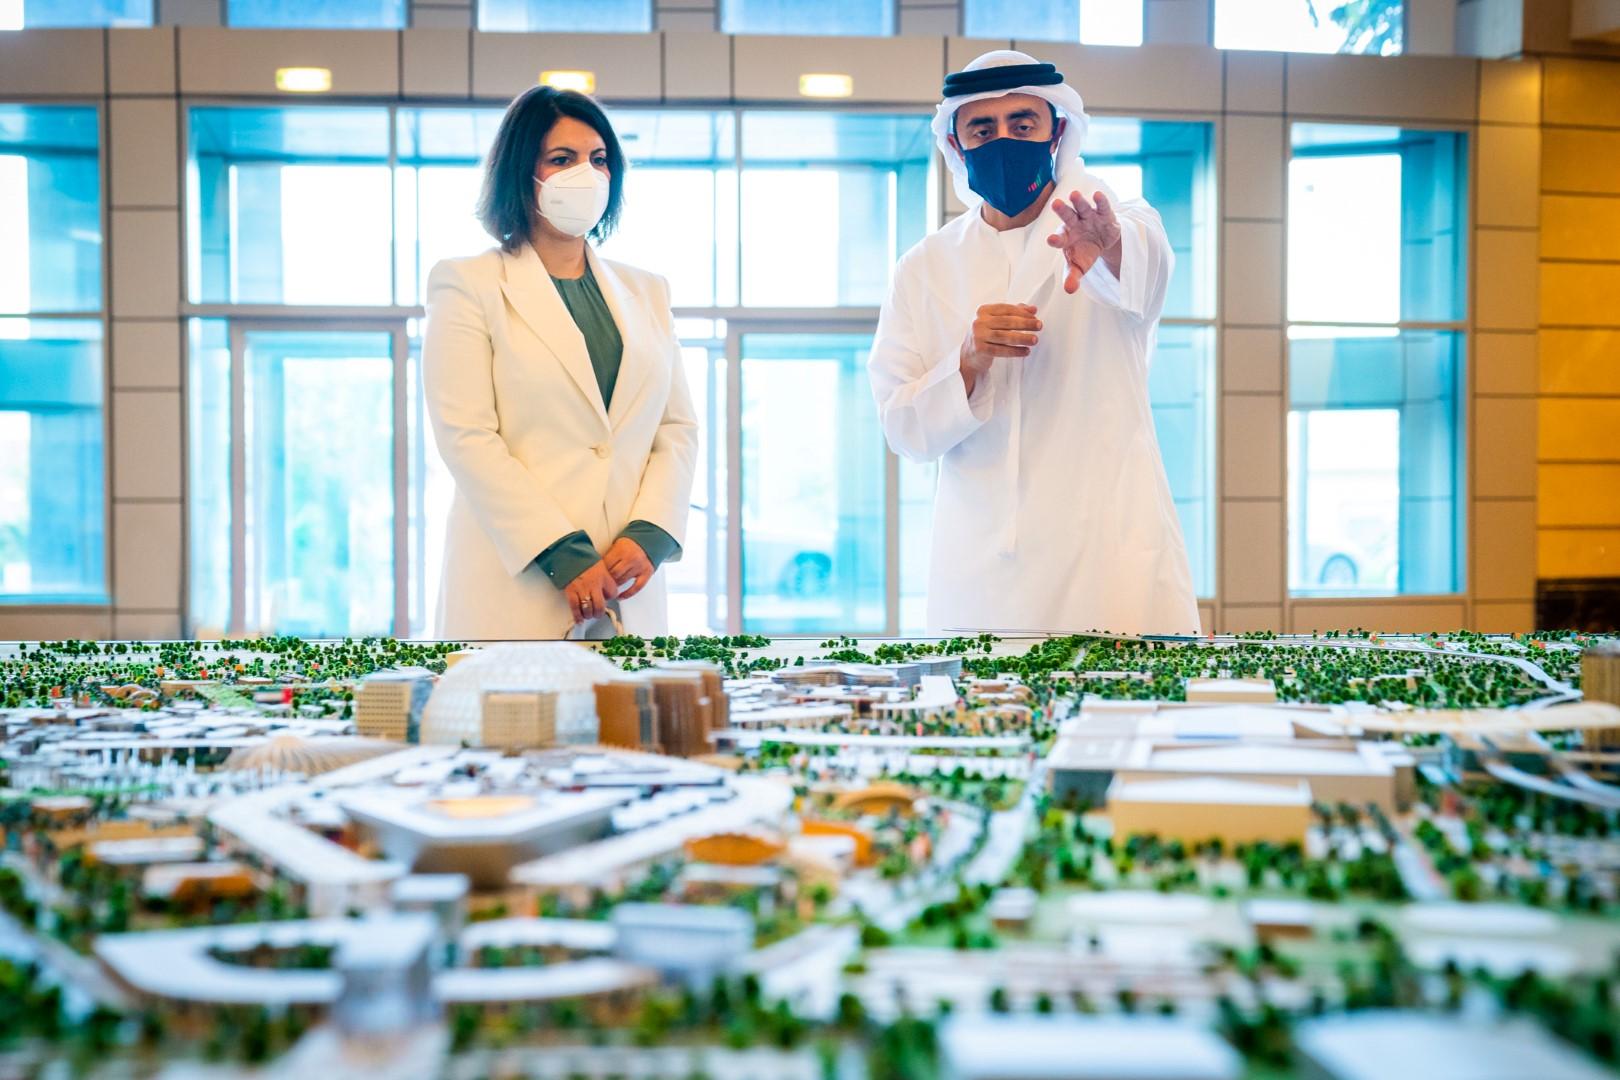 UAE Foreign Minister Abdullah bin Zayed meets Libyan counterpart Najla Mangoush. (WAM)